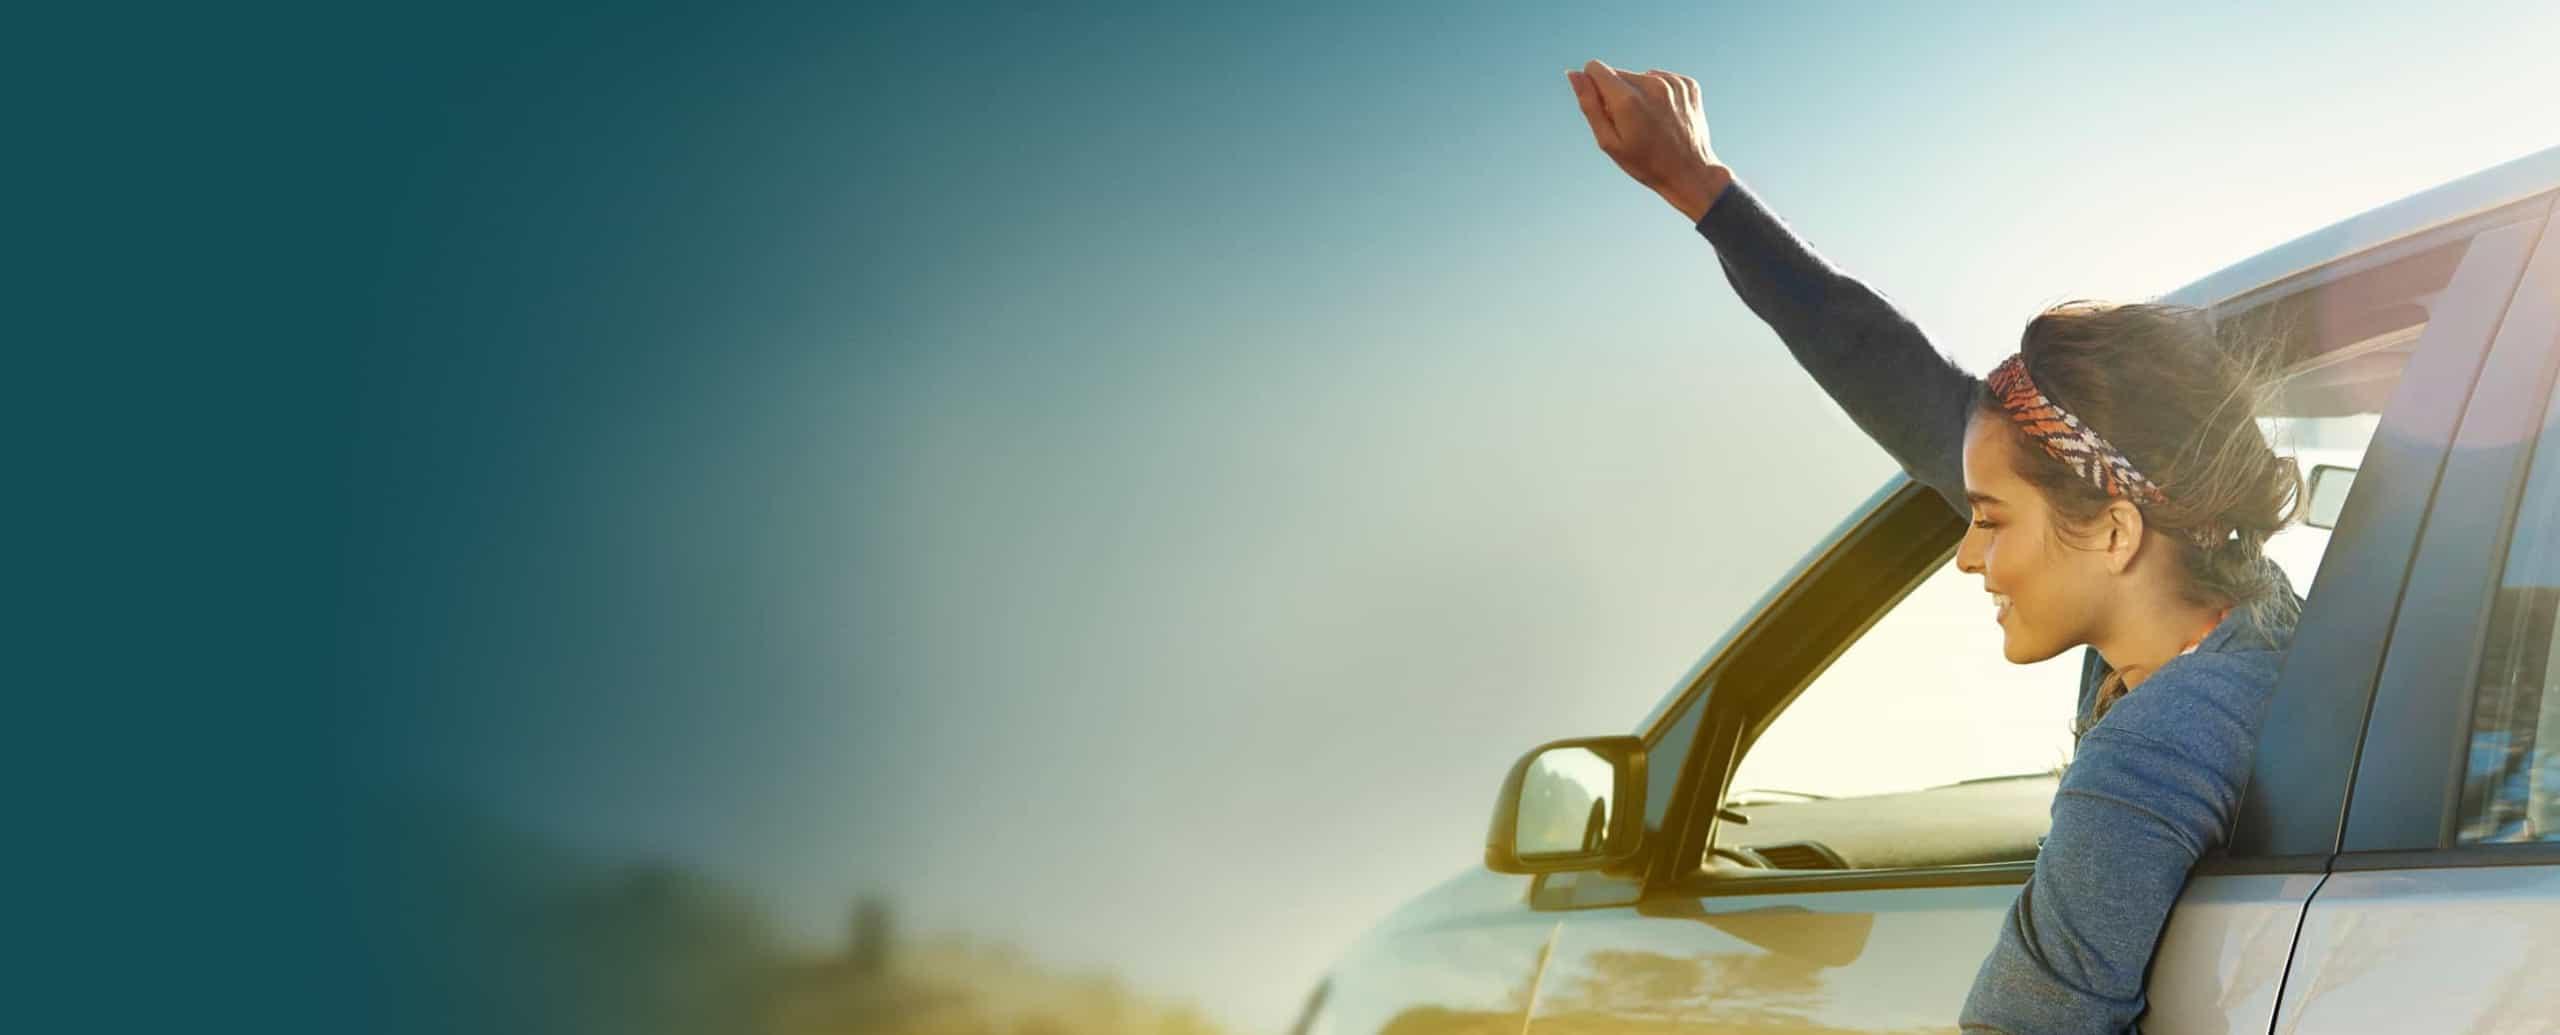 Compare Car Insurance Quotes Online 2019 Rates Compare Com